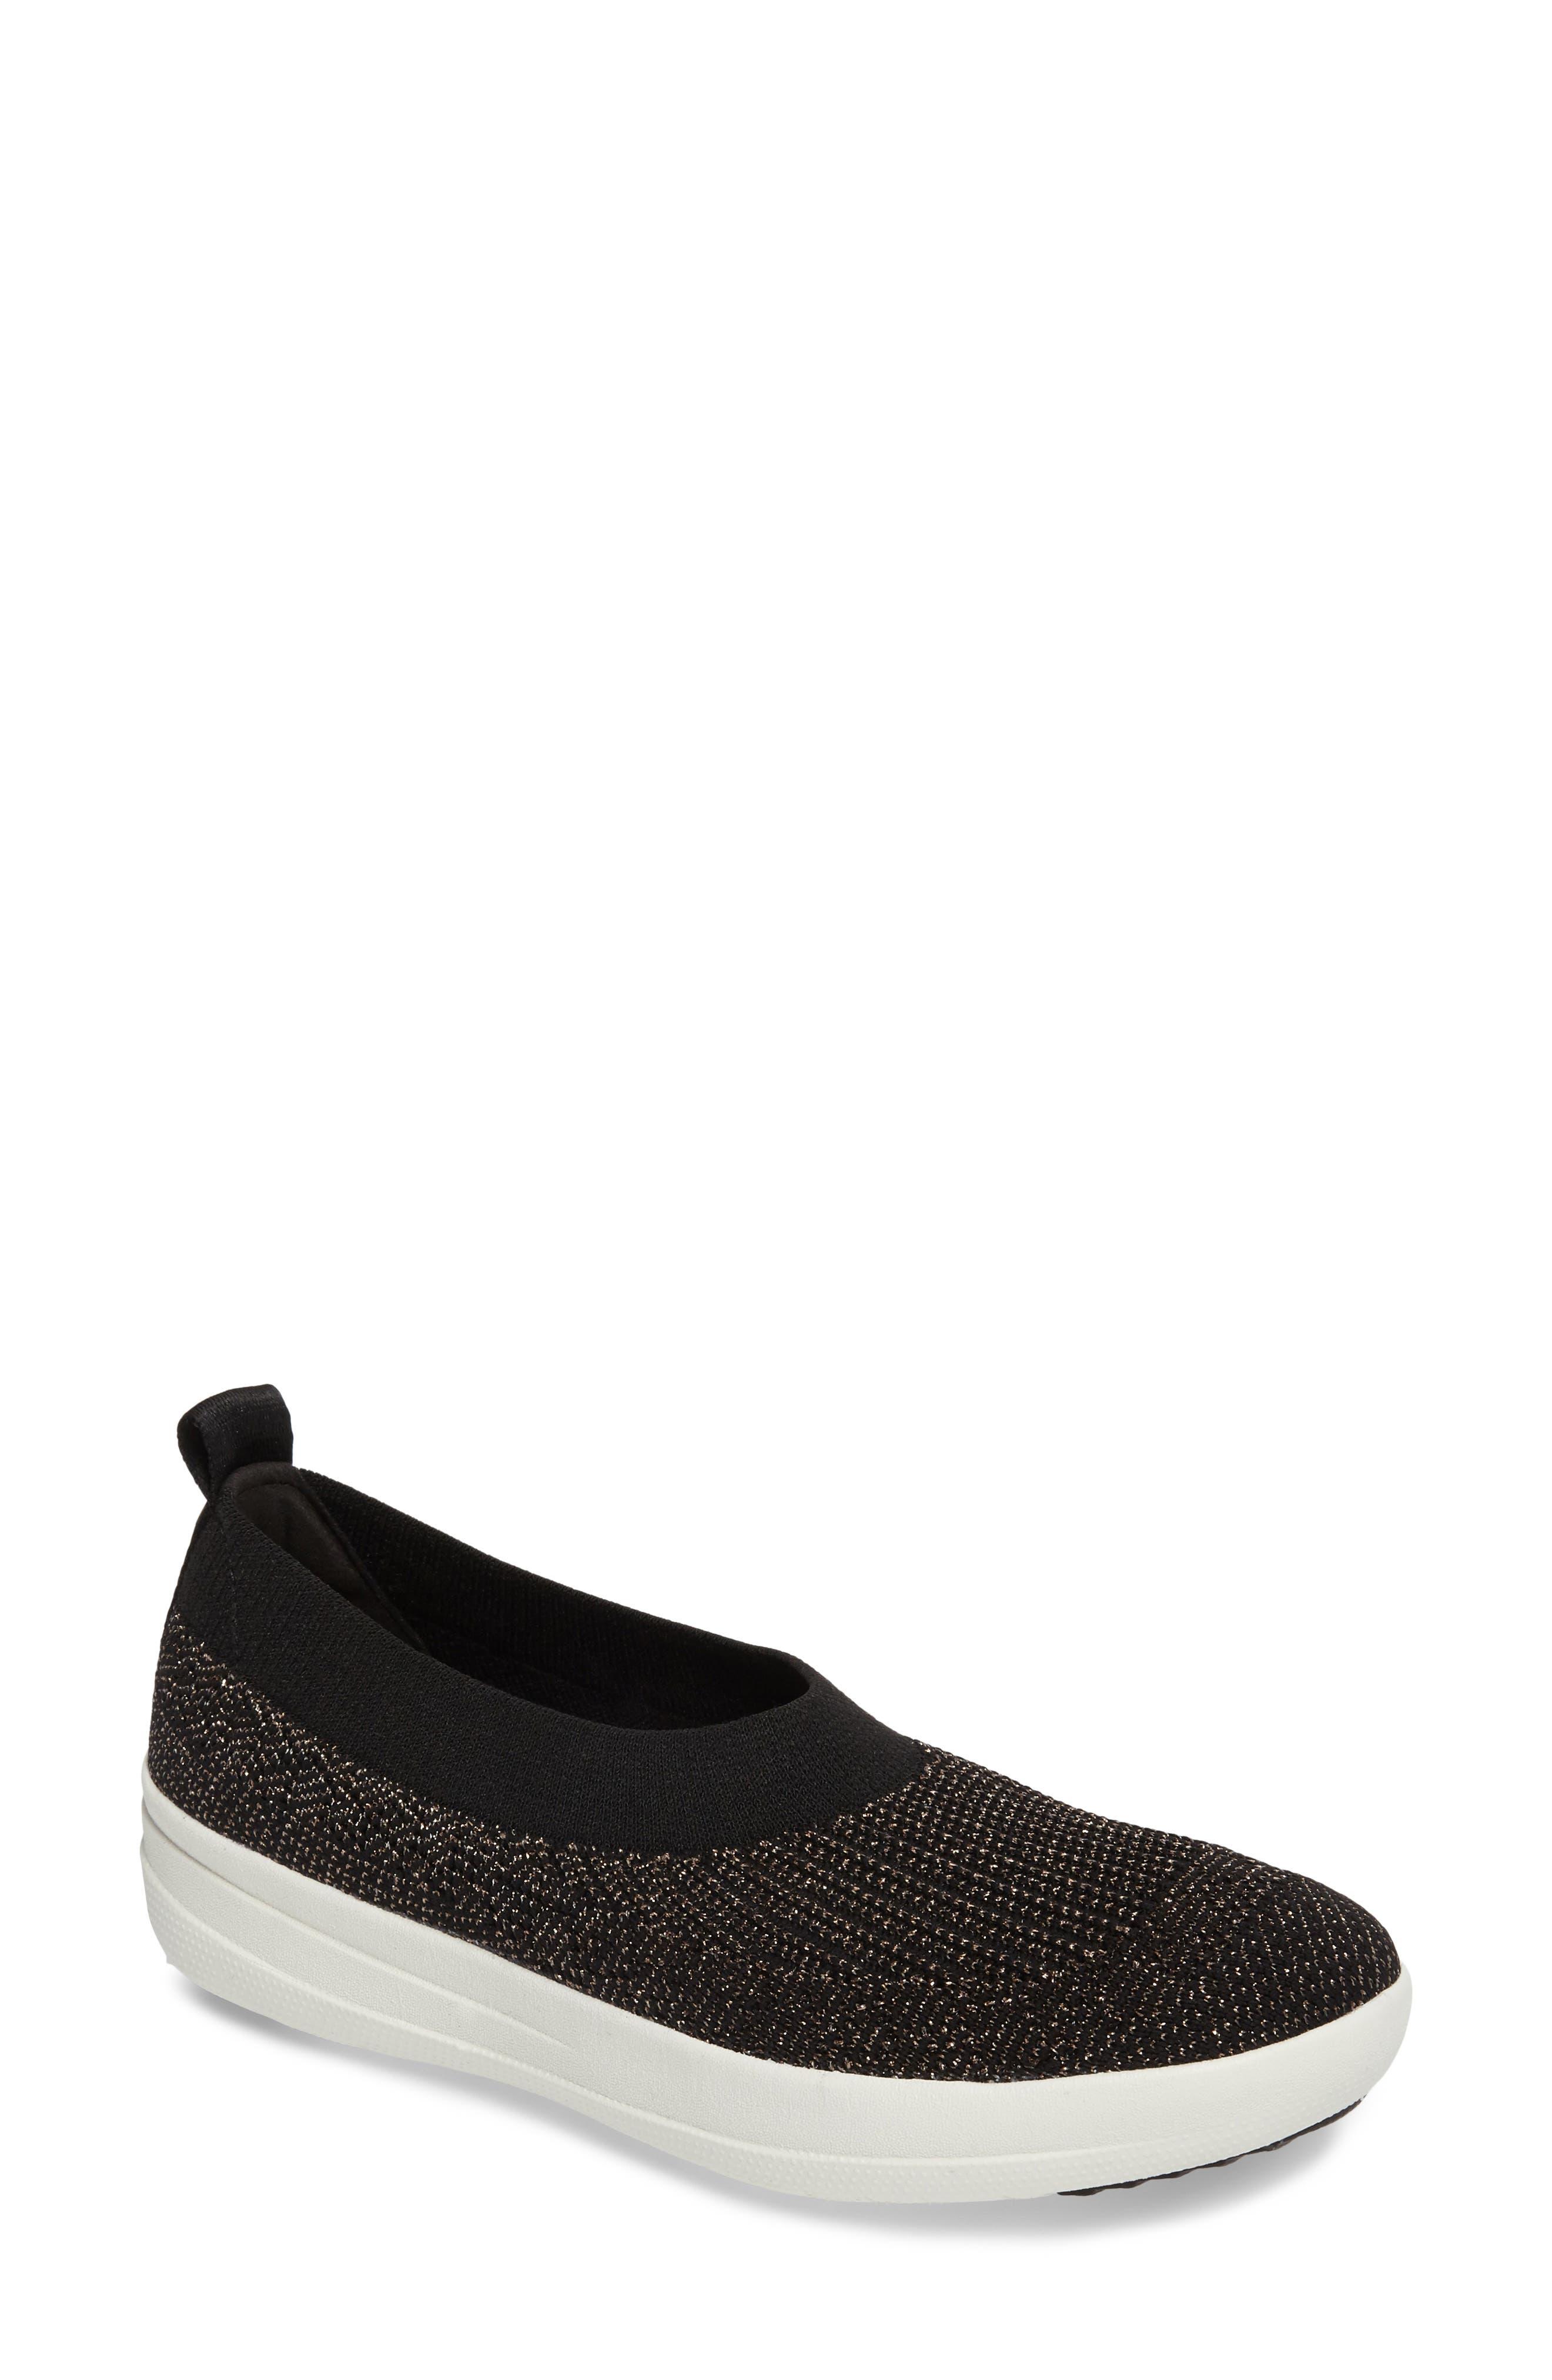 Uberknit<sup>™</sup> Slip-On Ballerina Sneaker,                             Main thumbnail 1, color,                             001